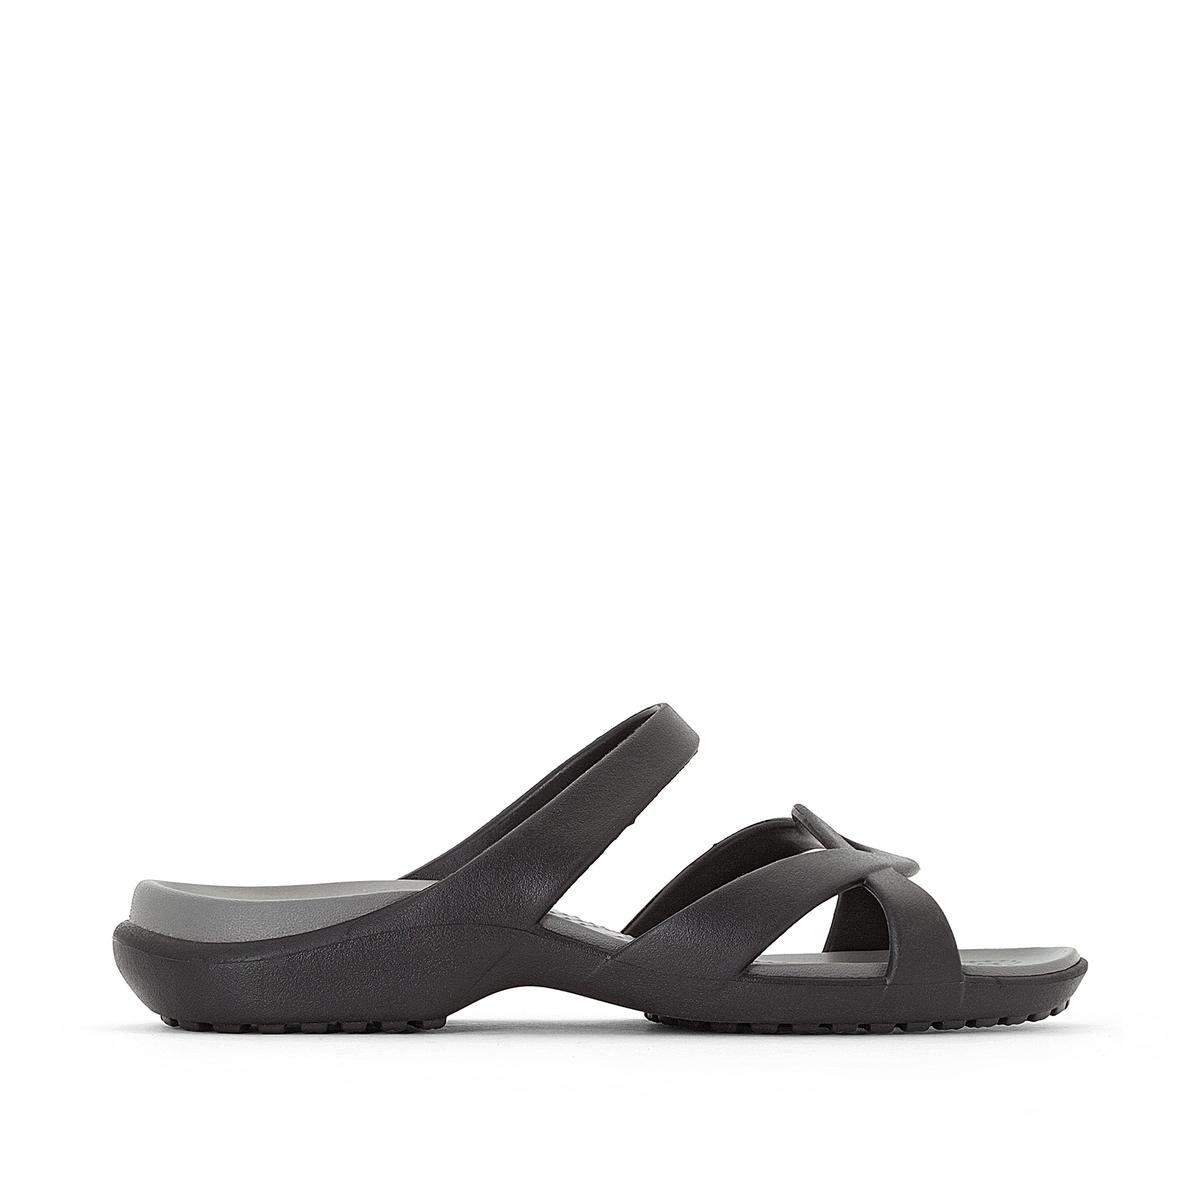 Туфли без задника Meleen Twist Sandal W crocs сандали keeley frozen fever sandal k для девочки crocs